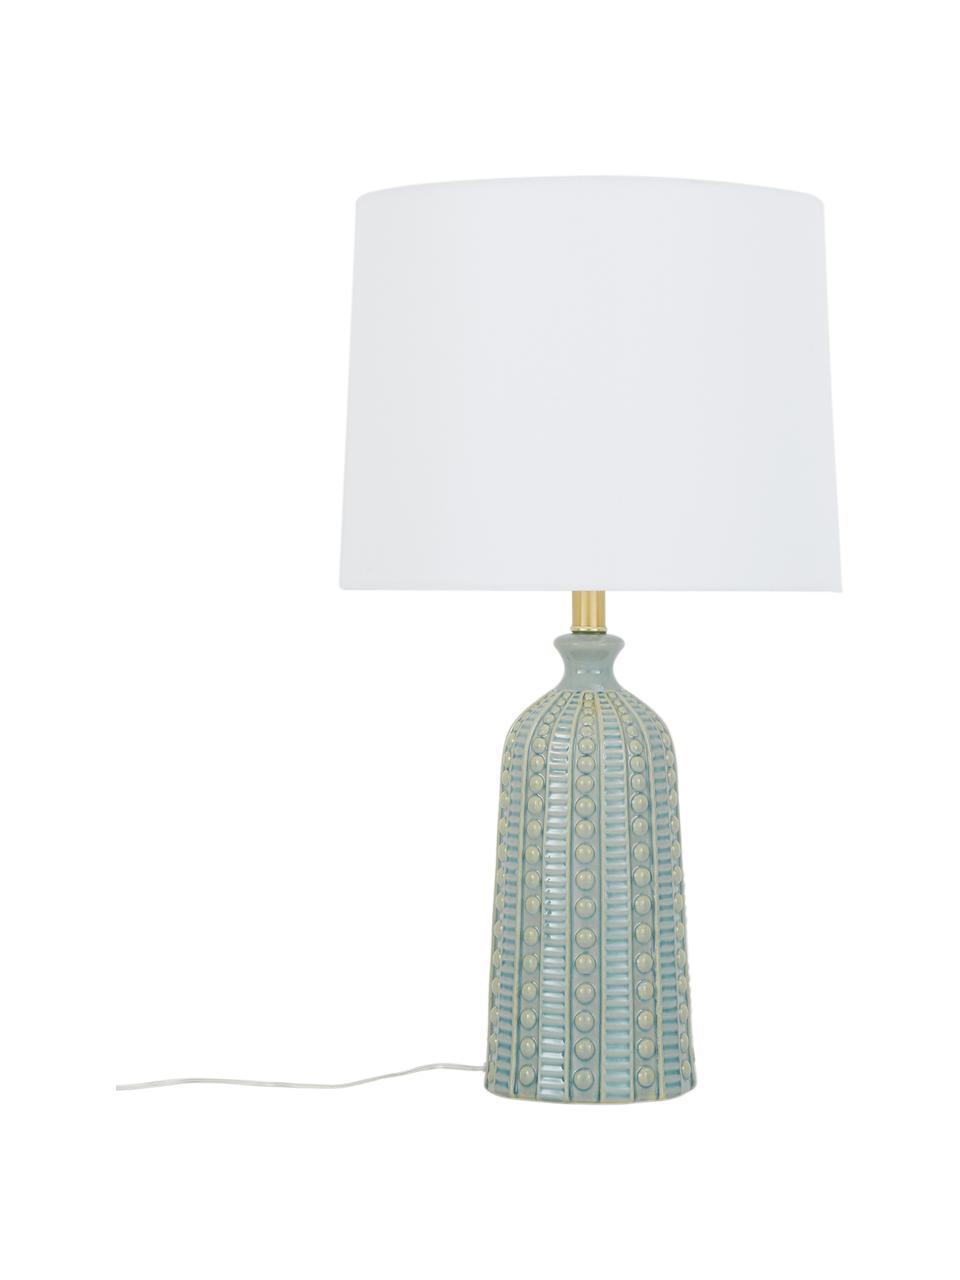 Grote keramiek tafellamp Nizza in saliegroen, Lampenkap: textiel, Lampvoet: keramiek, Saliegroen, Ø 33 x H 60 cm